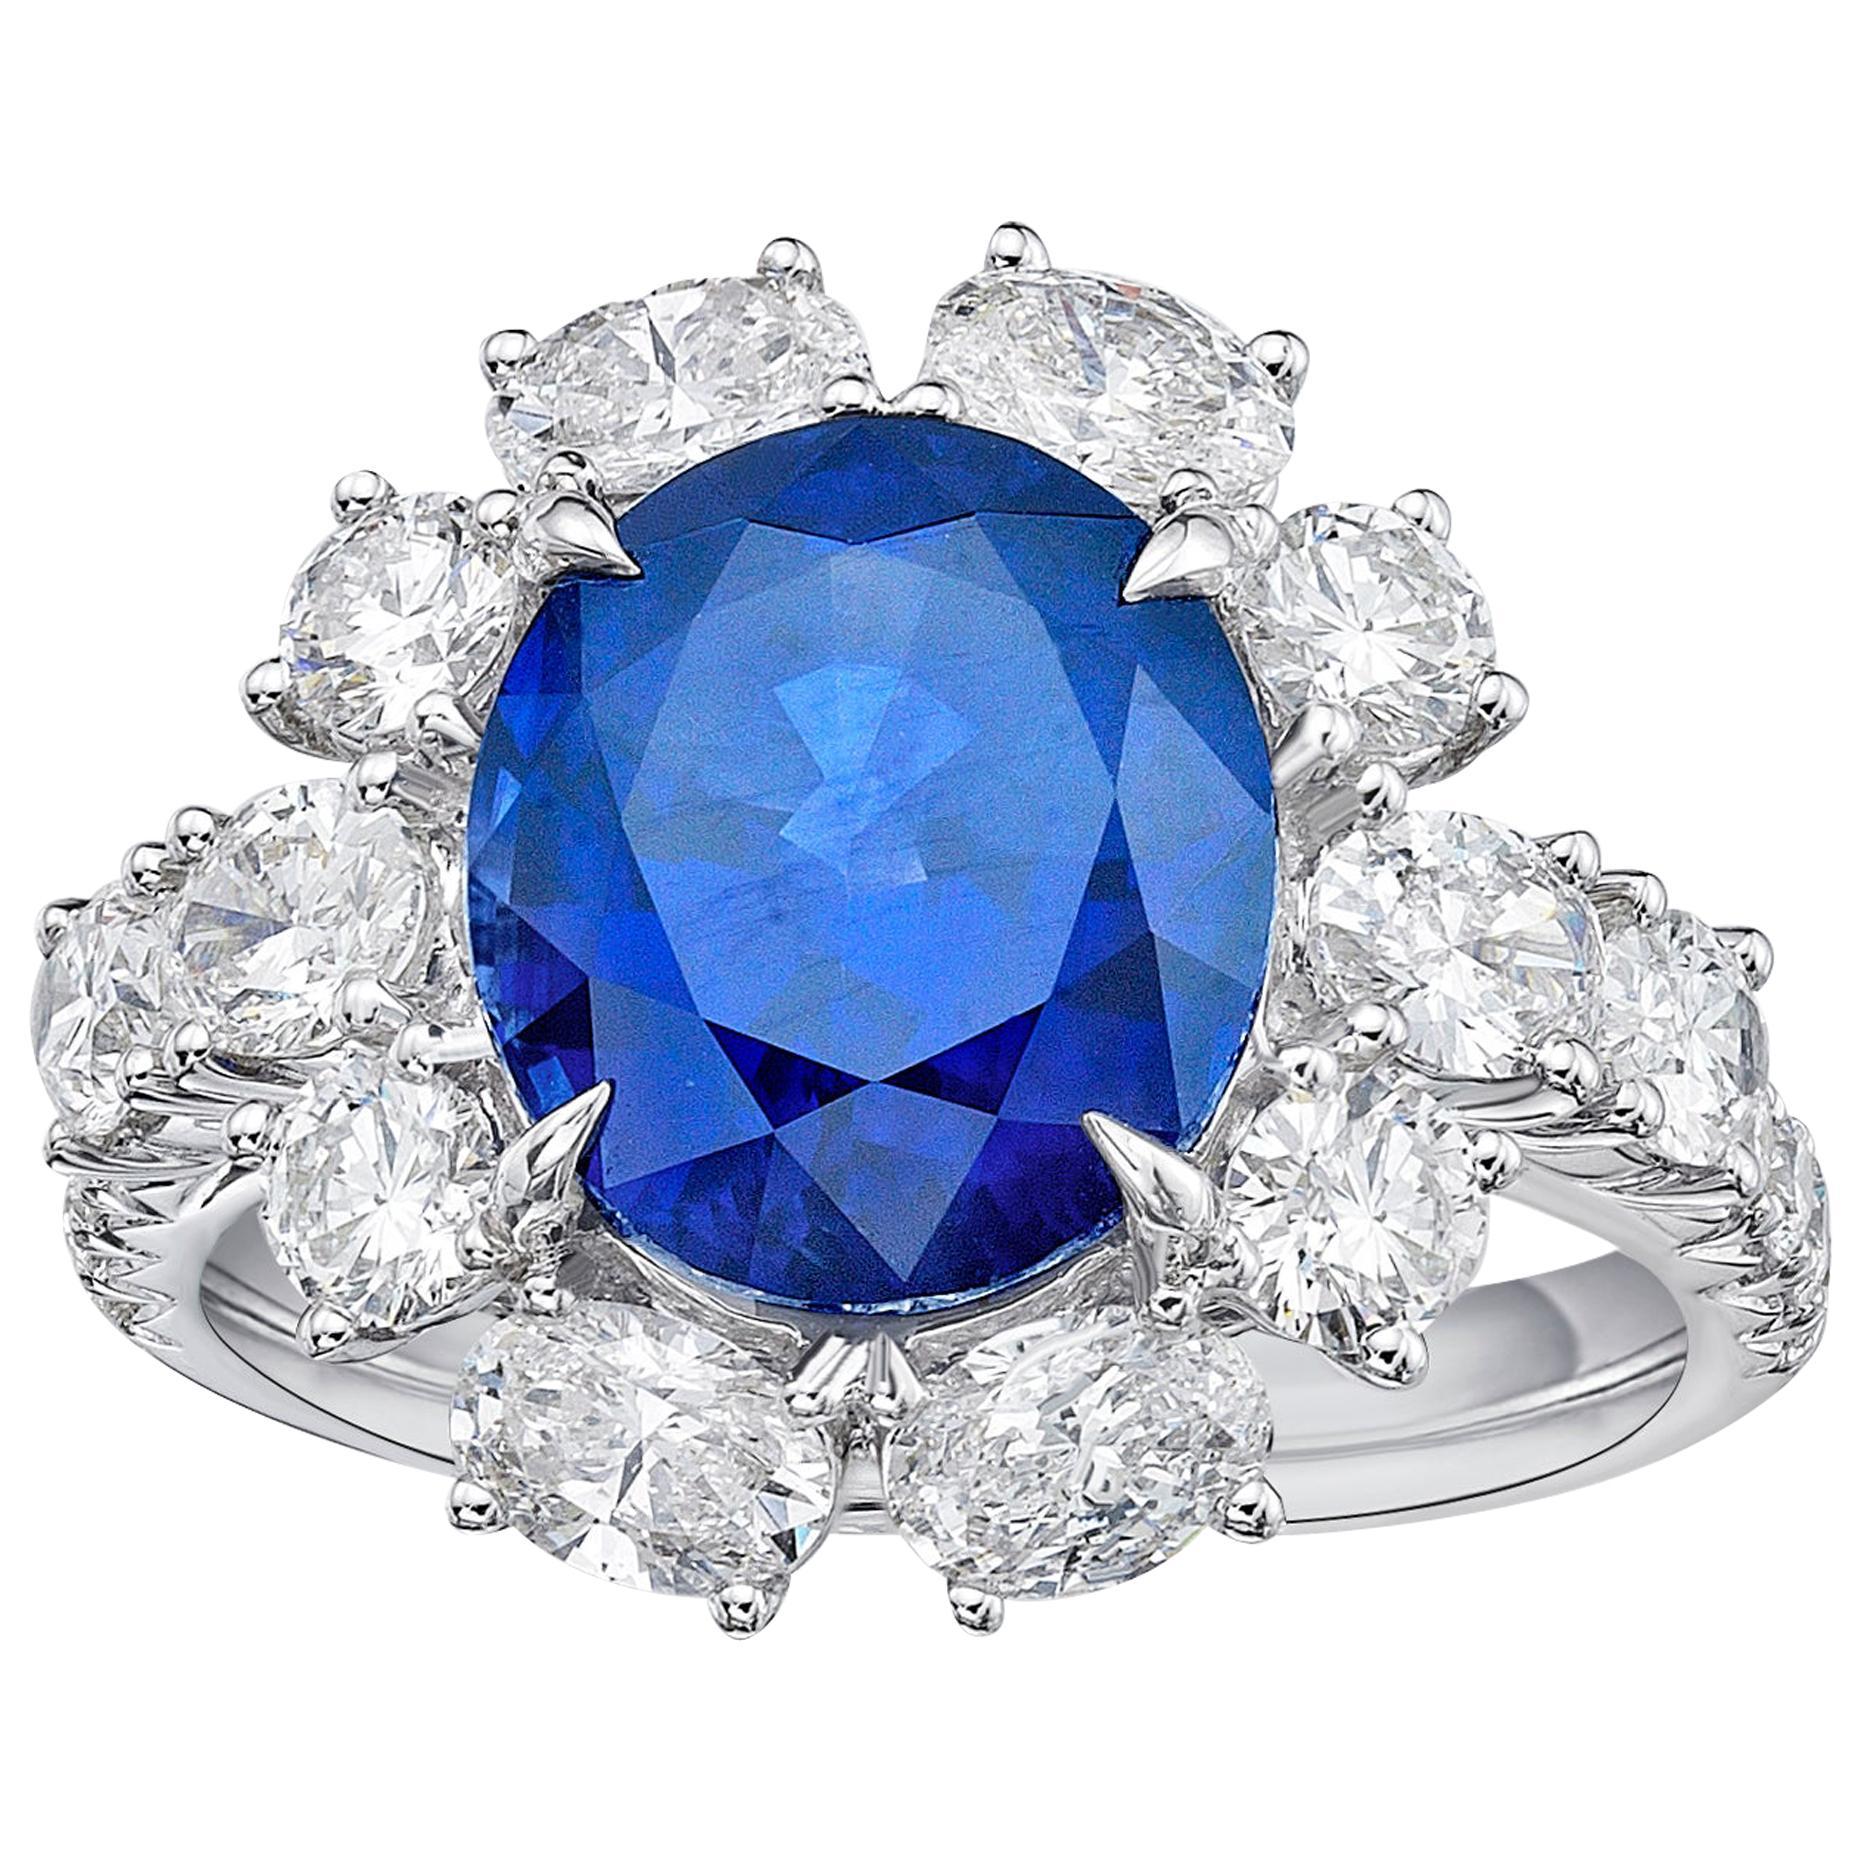 KAHN GRS Certified 6.22 Carat Ceylon Blue Sapphire Ring 'Heated'